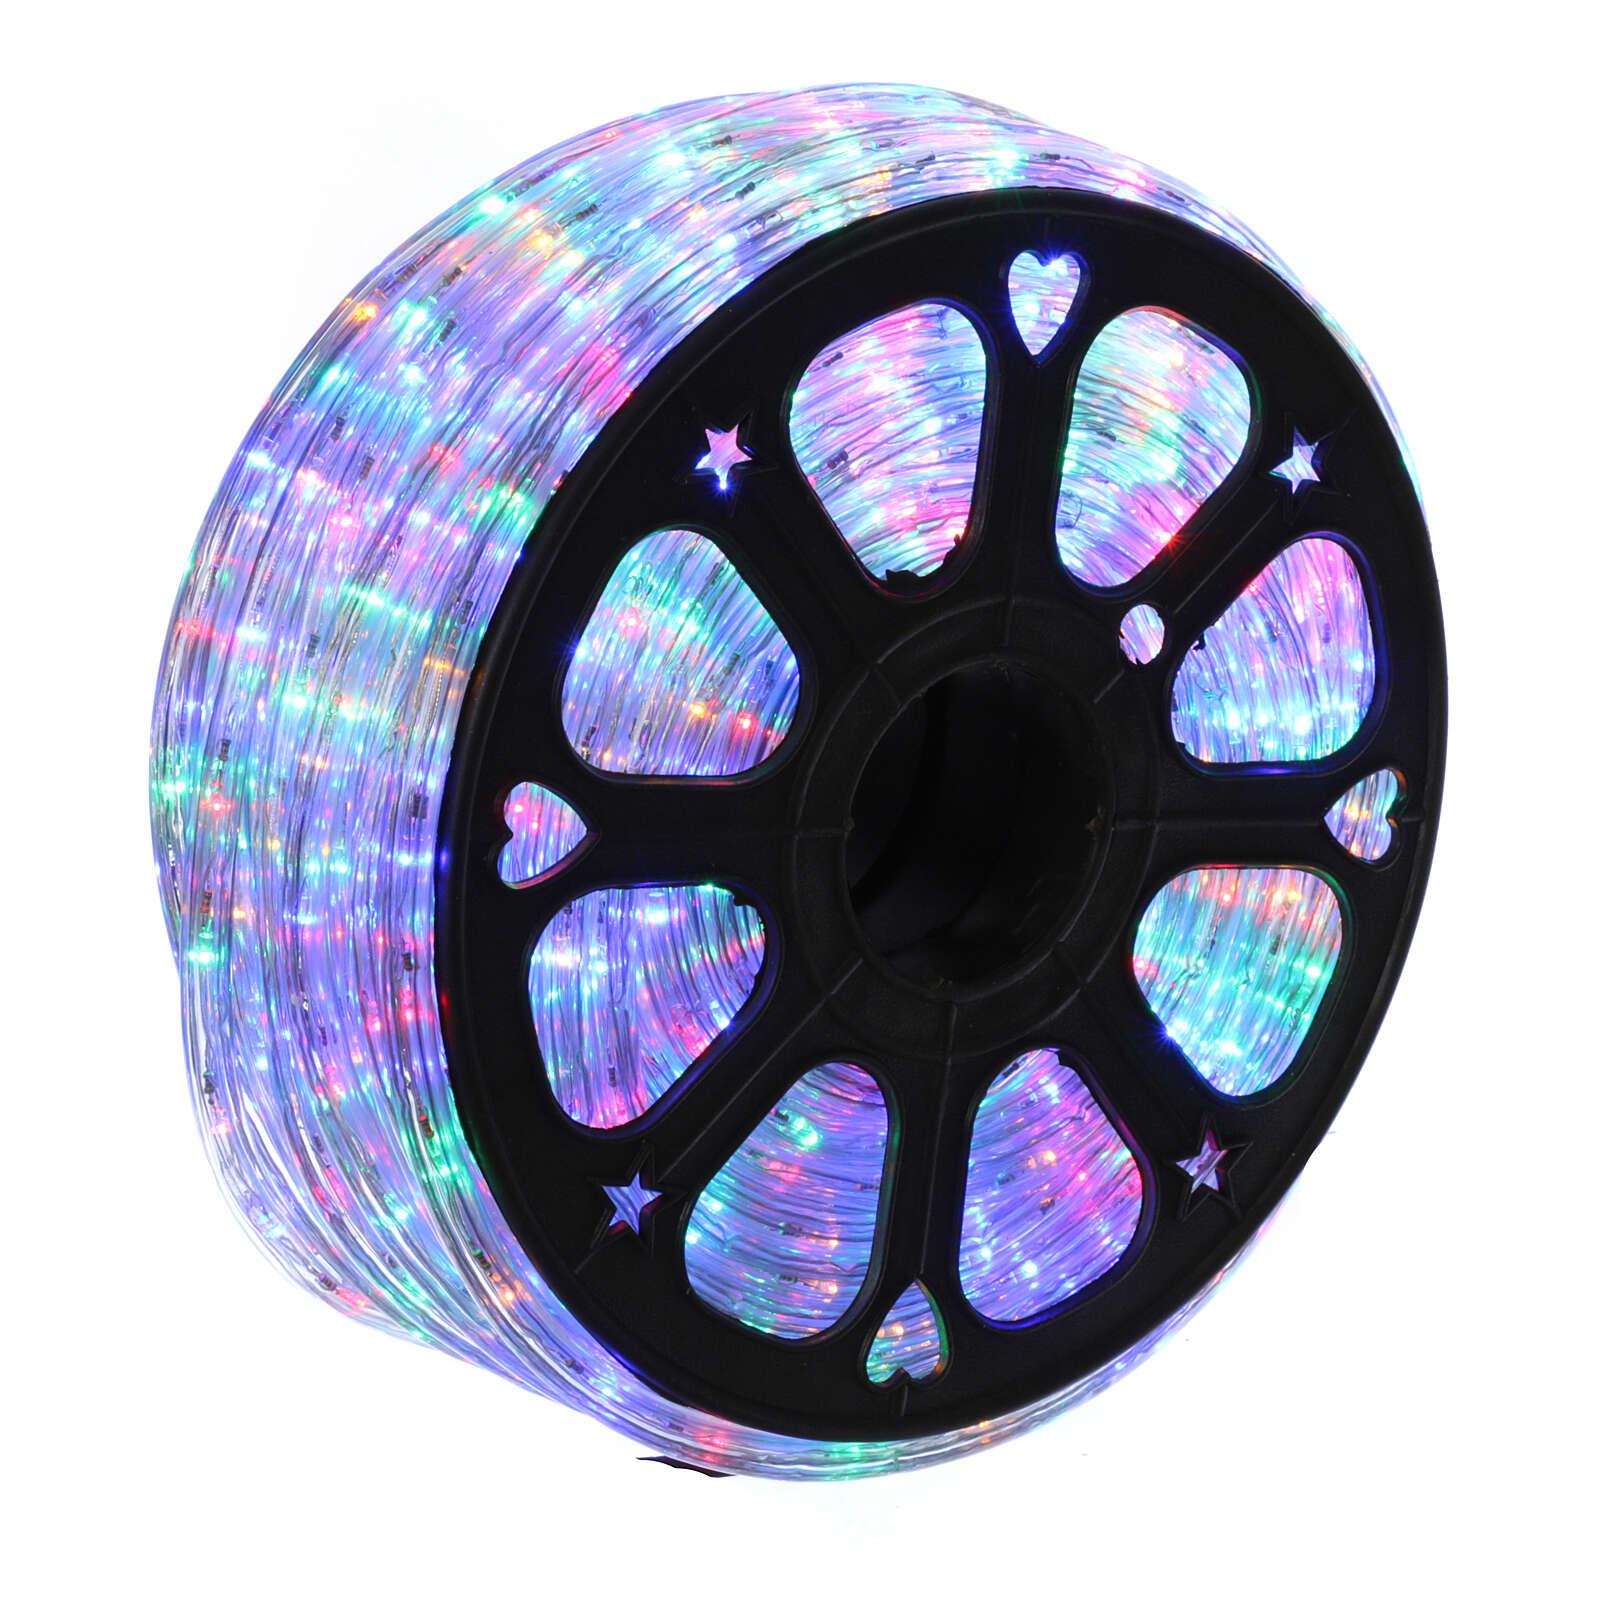 Luce tubo led multicolor 50 m 3 vie a taglio 3